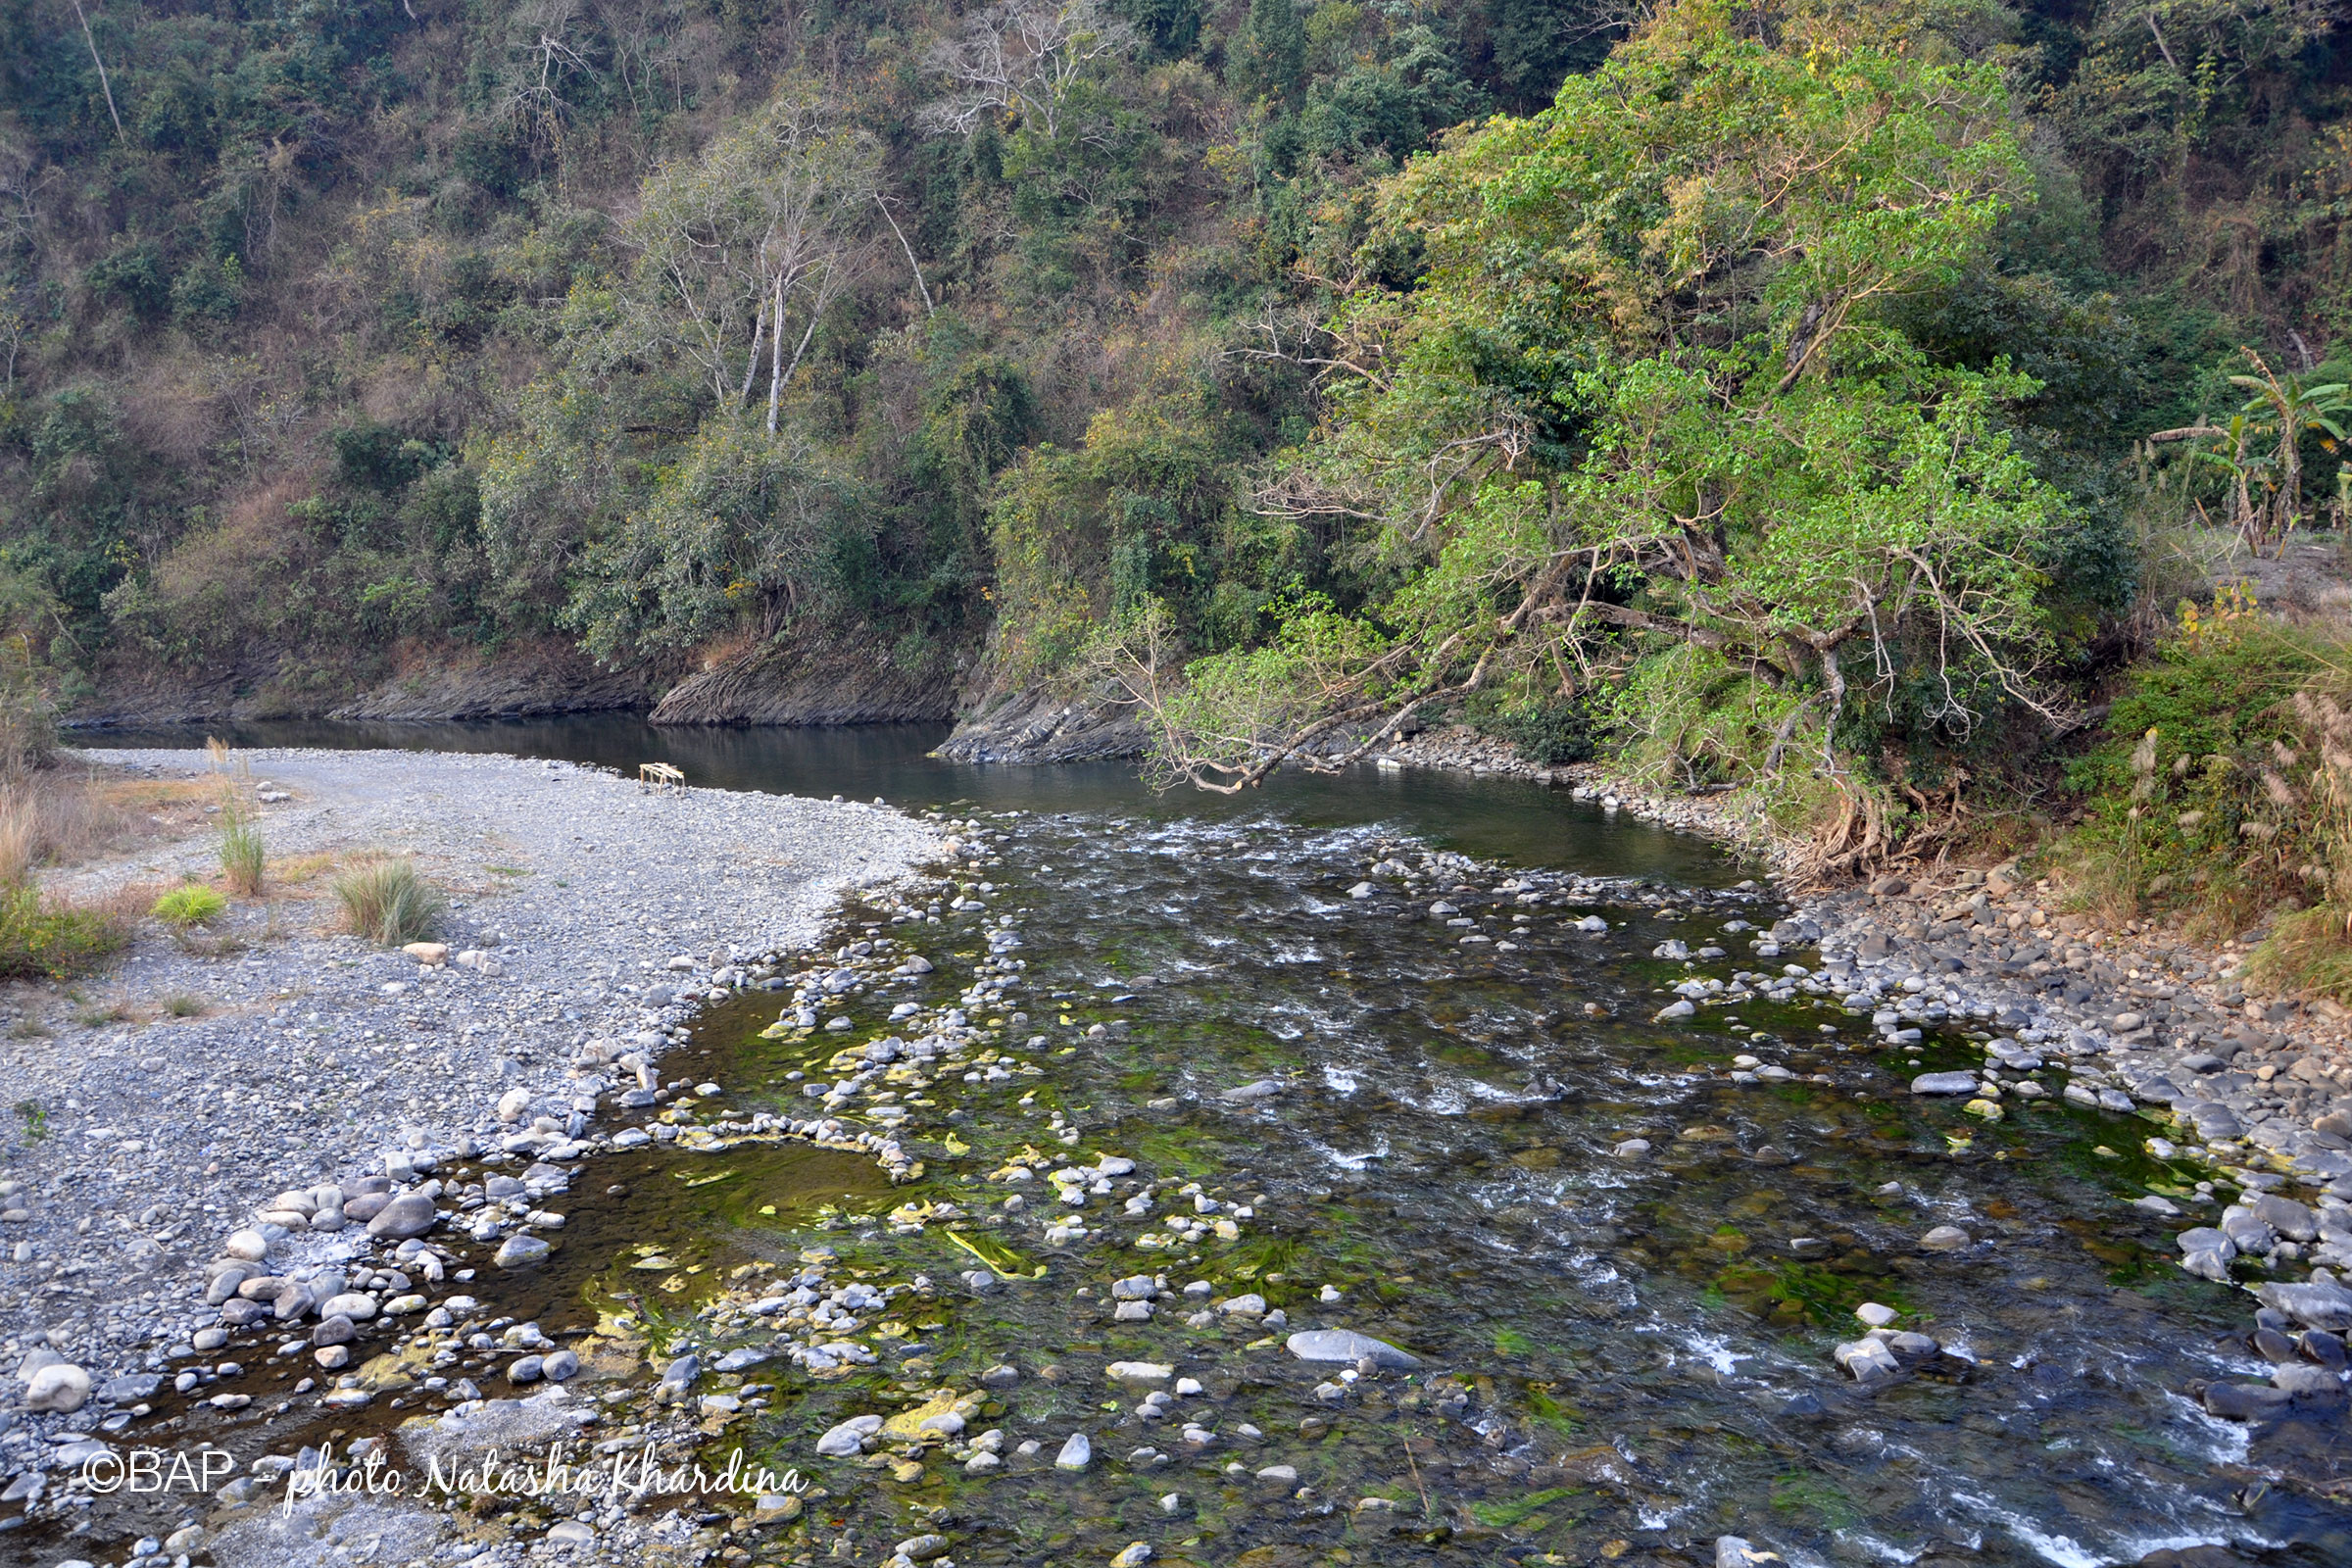 Jiji River, Nagaland, India. Photo by N. Khardina